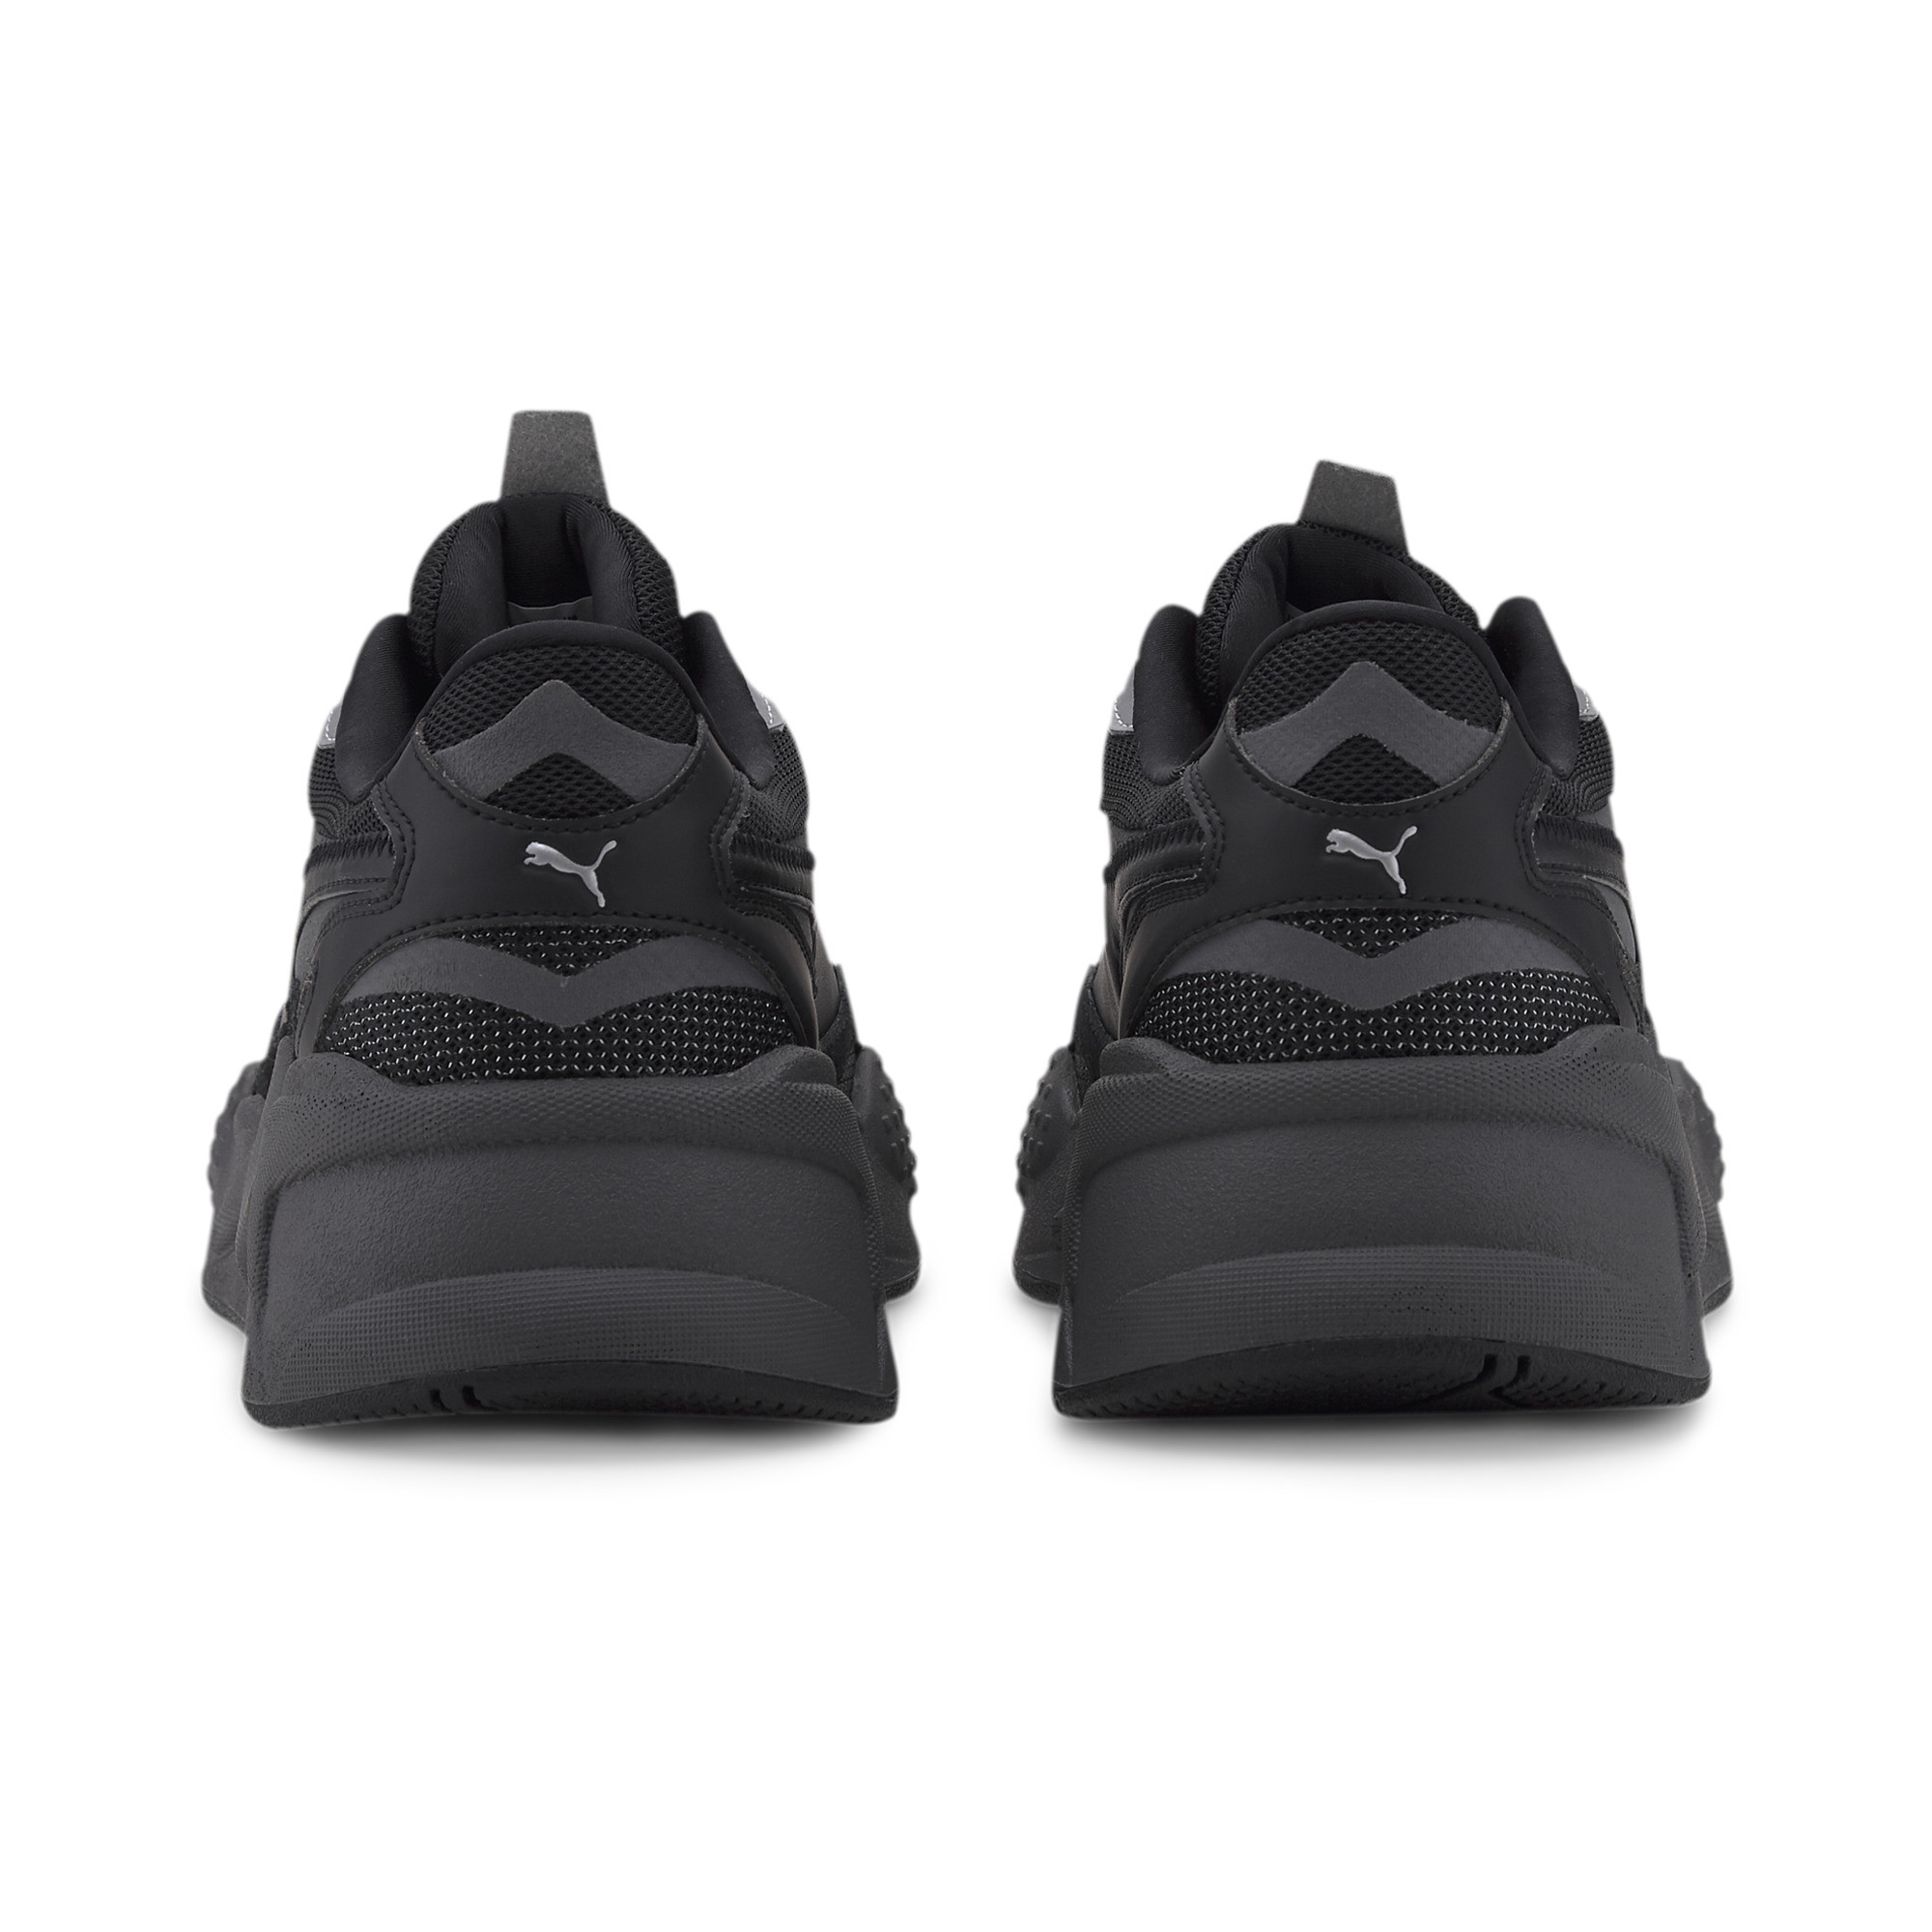 PUMA-Men-039-s-RS-X-Puzzle-Sneakers thumbnail 23